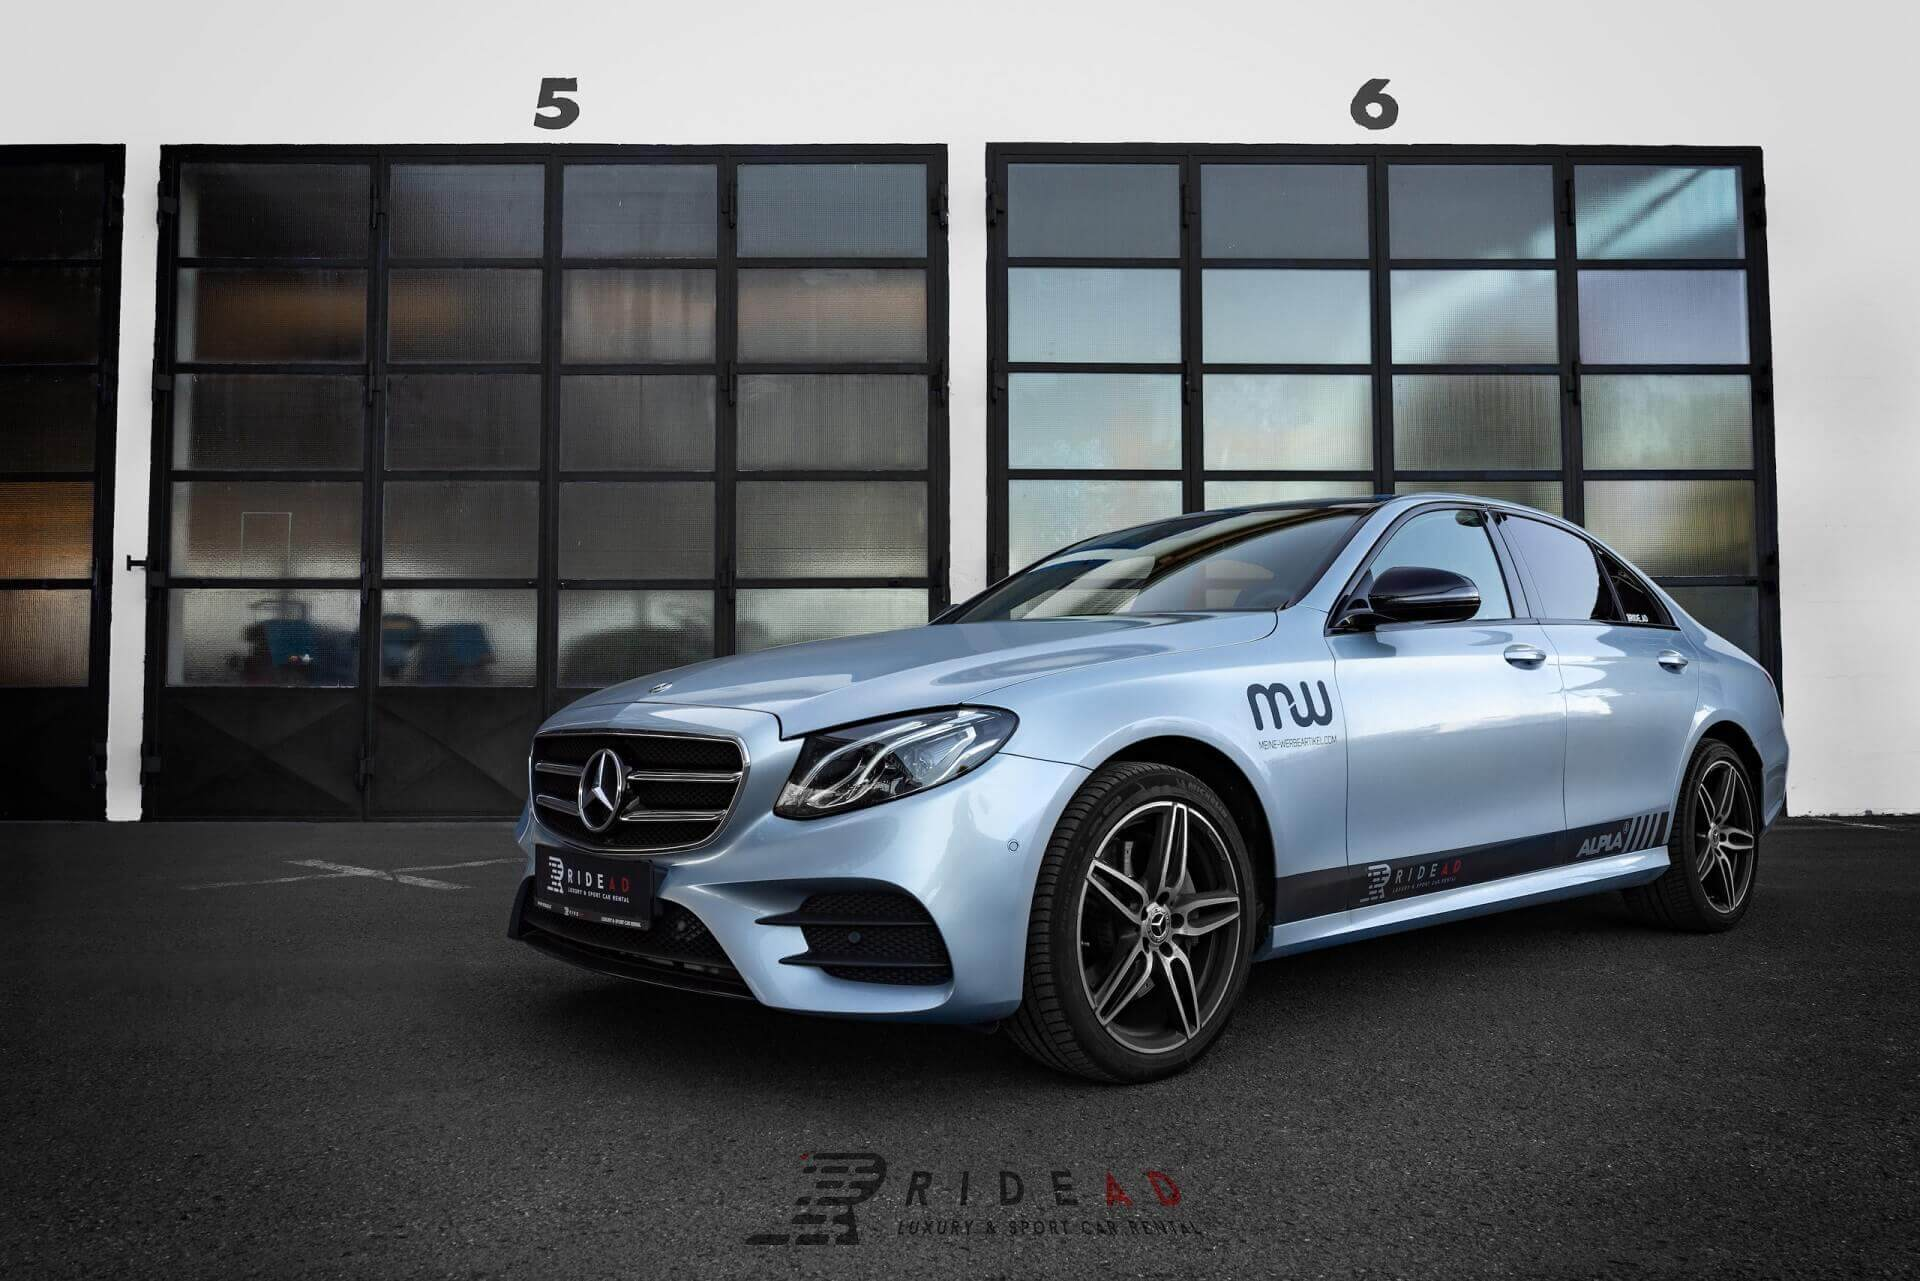 Ride Ad Luxury and Sports Car Rental - Mercedes-Benz E220d Kurzzeitmiete 1